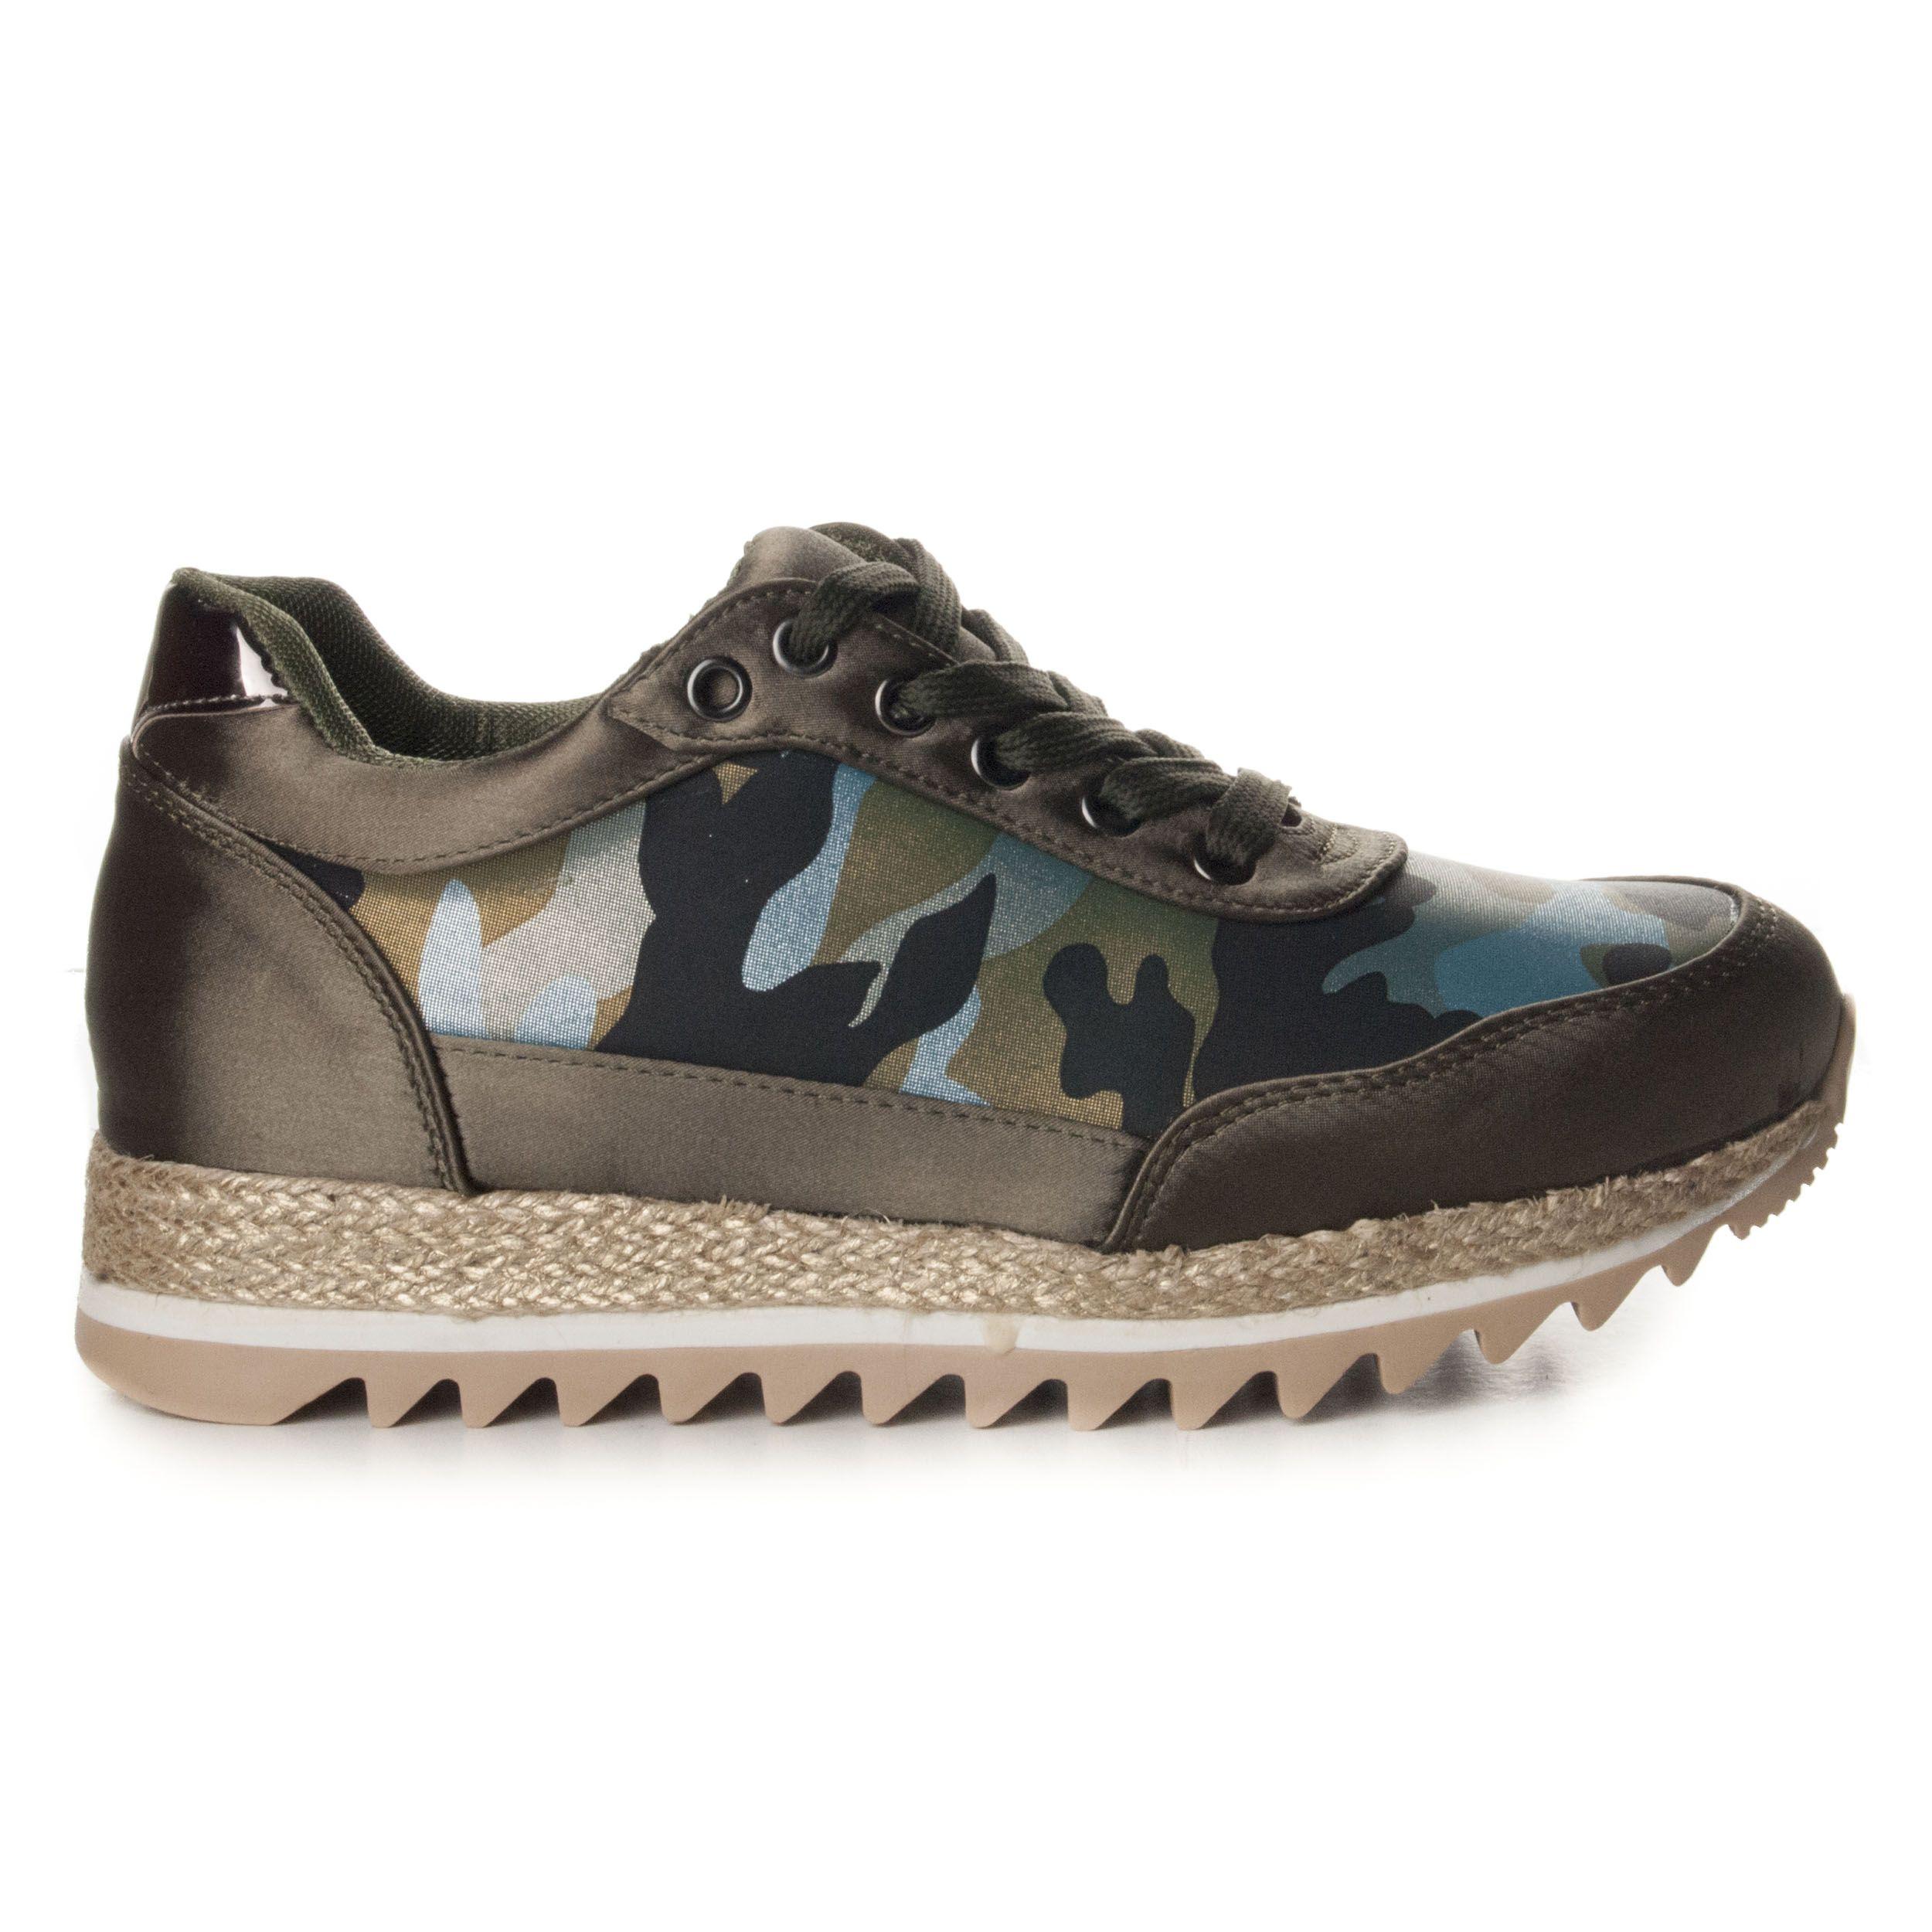 Montevita Wedge Sandal in Camouflage